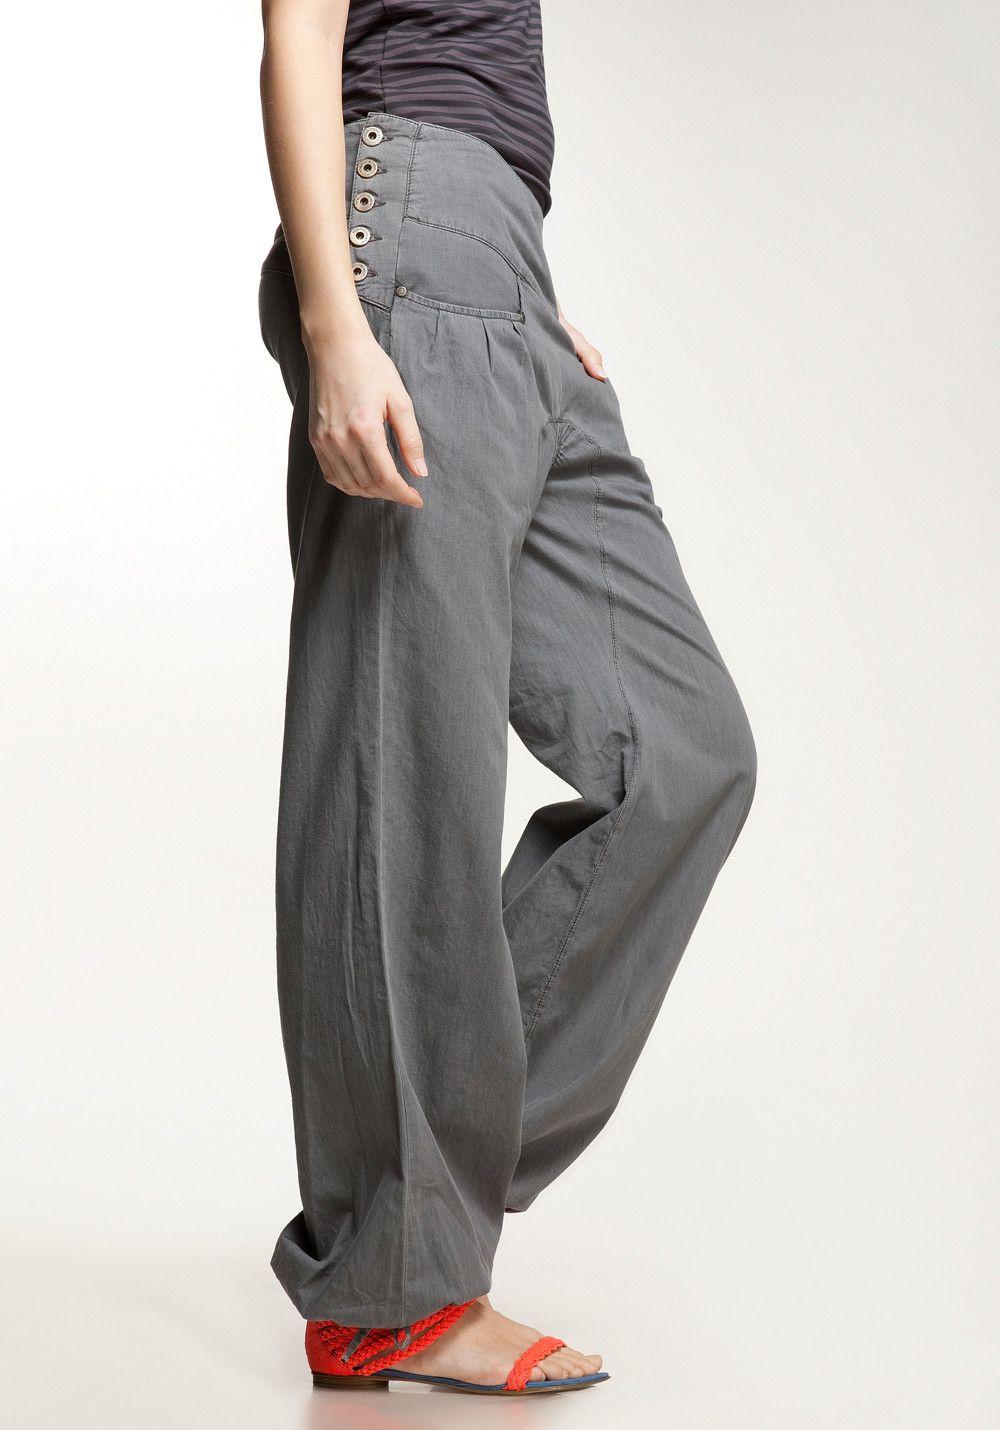 NIKITA Bluebird Jeans II greydenim, Anti Fit Jeans, | My Style ...